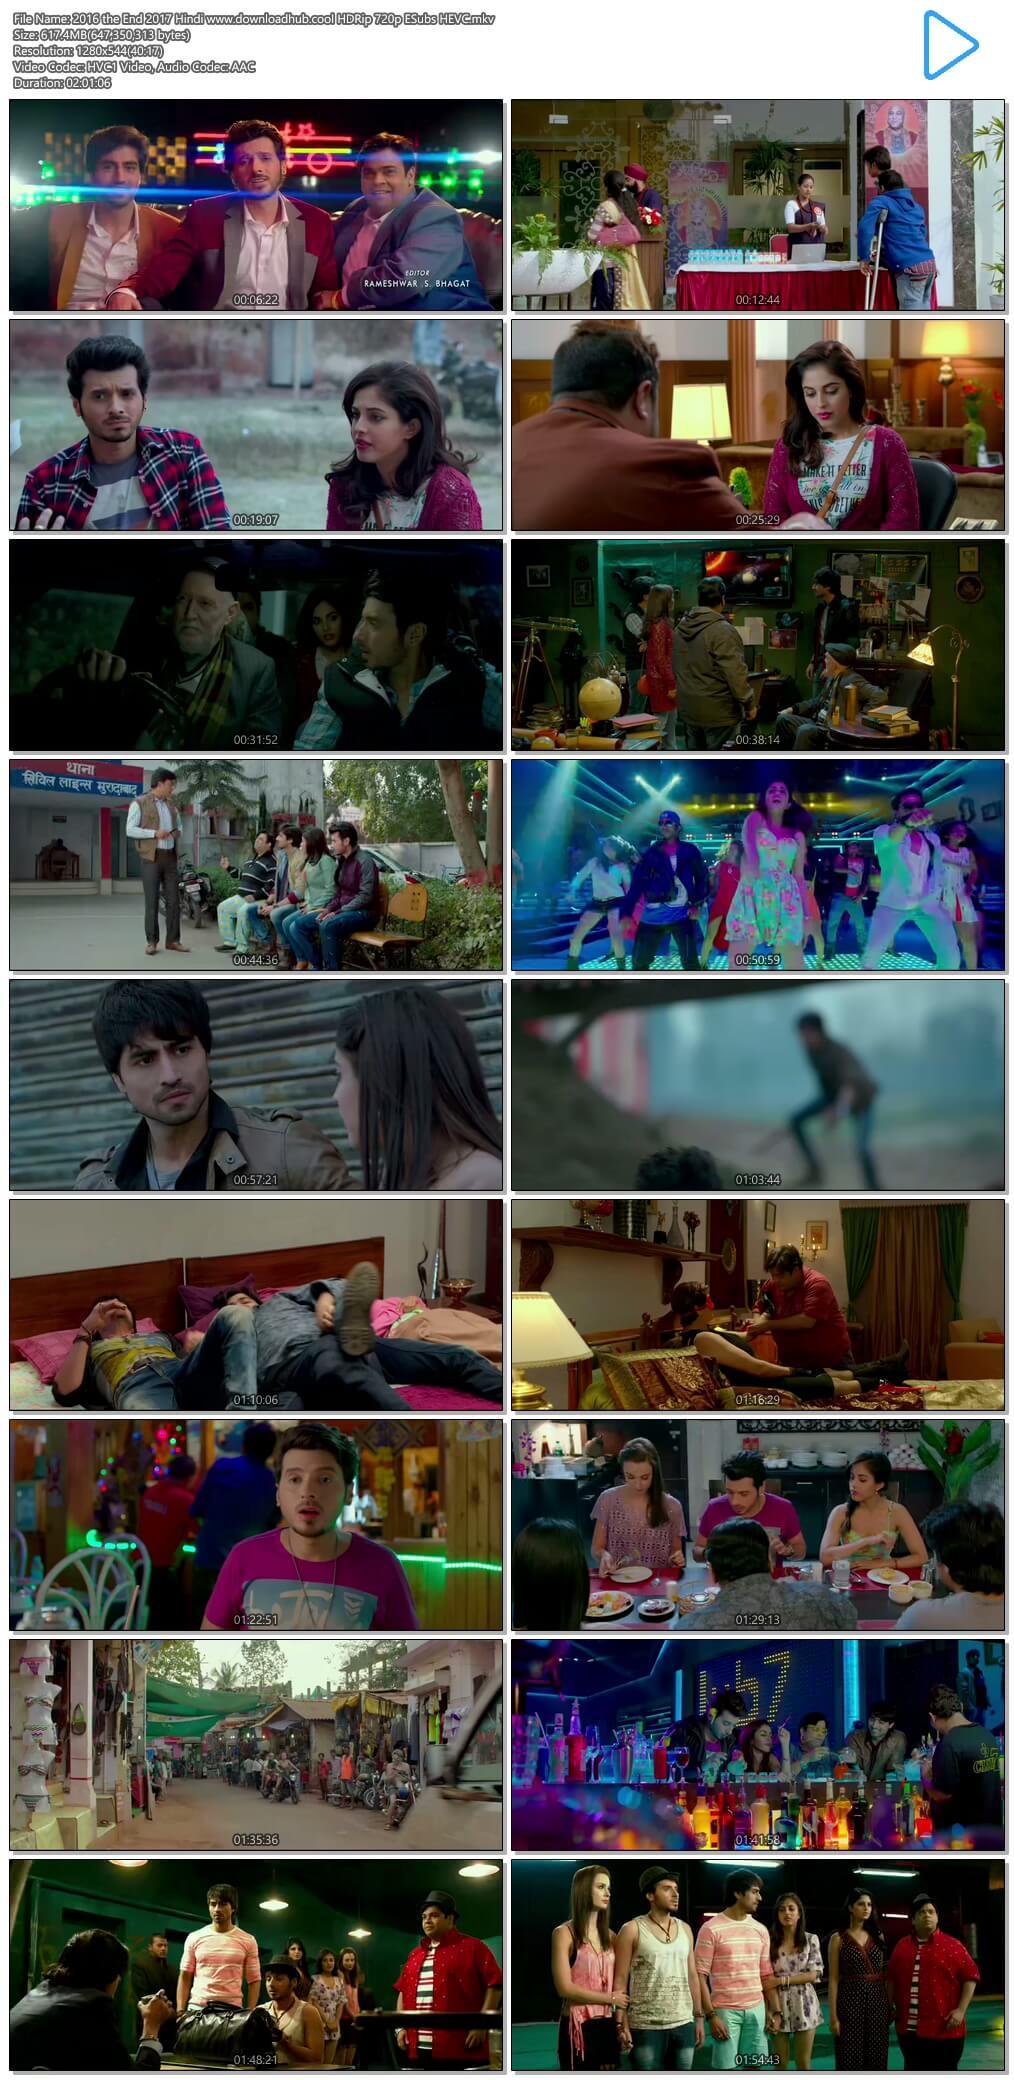 2016 the End 2017 Hindi 600MB HDRip 720p ESubs HEVC